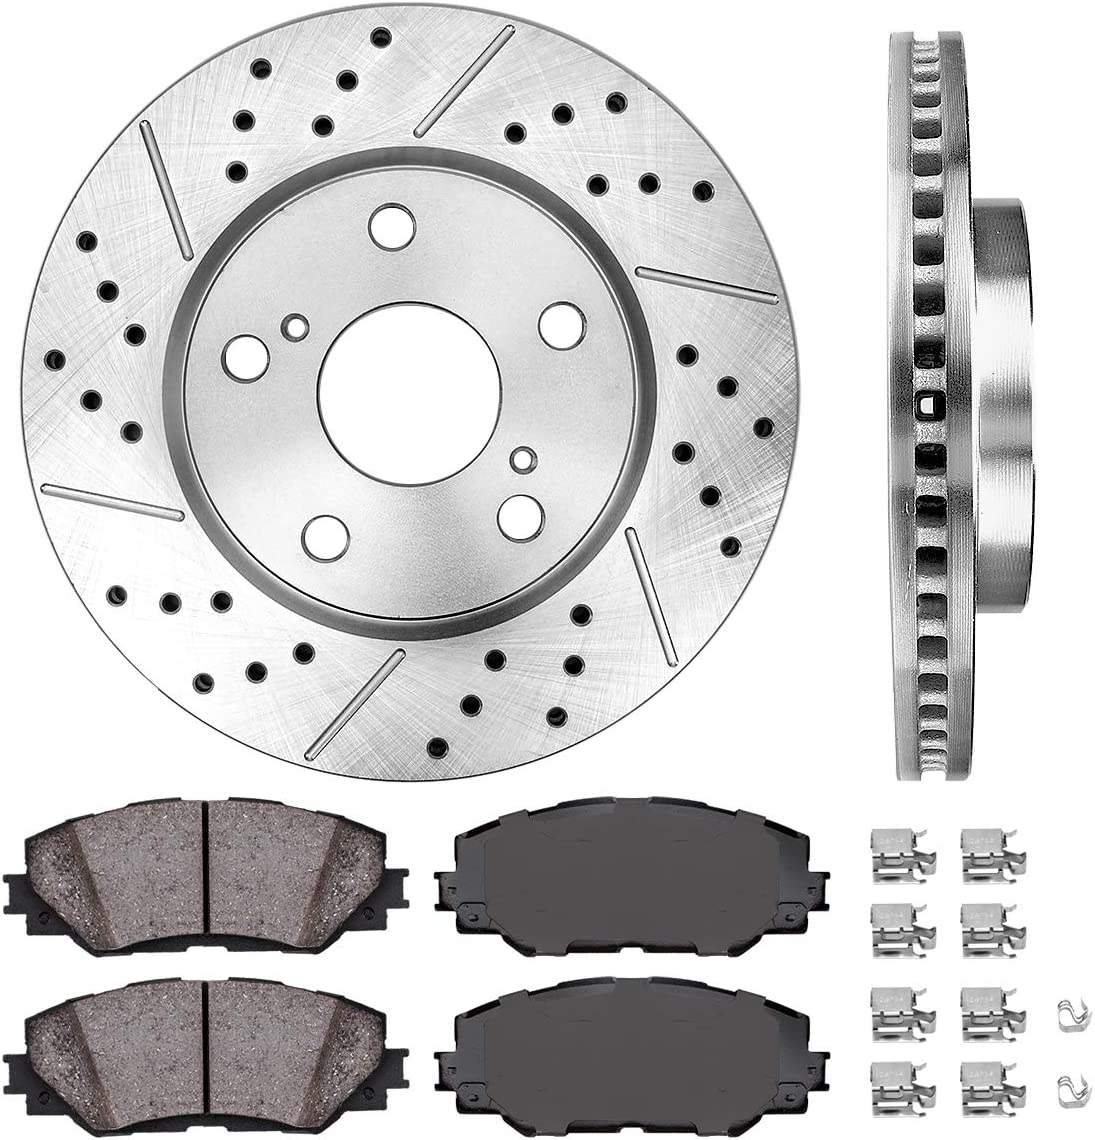 4 Ceramic Pads Fits:- RAV4 HS250h 5lug High-End Rear Kit 2 OEM Replacement Disc Brake Rotors